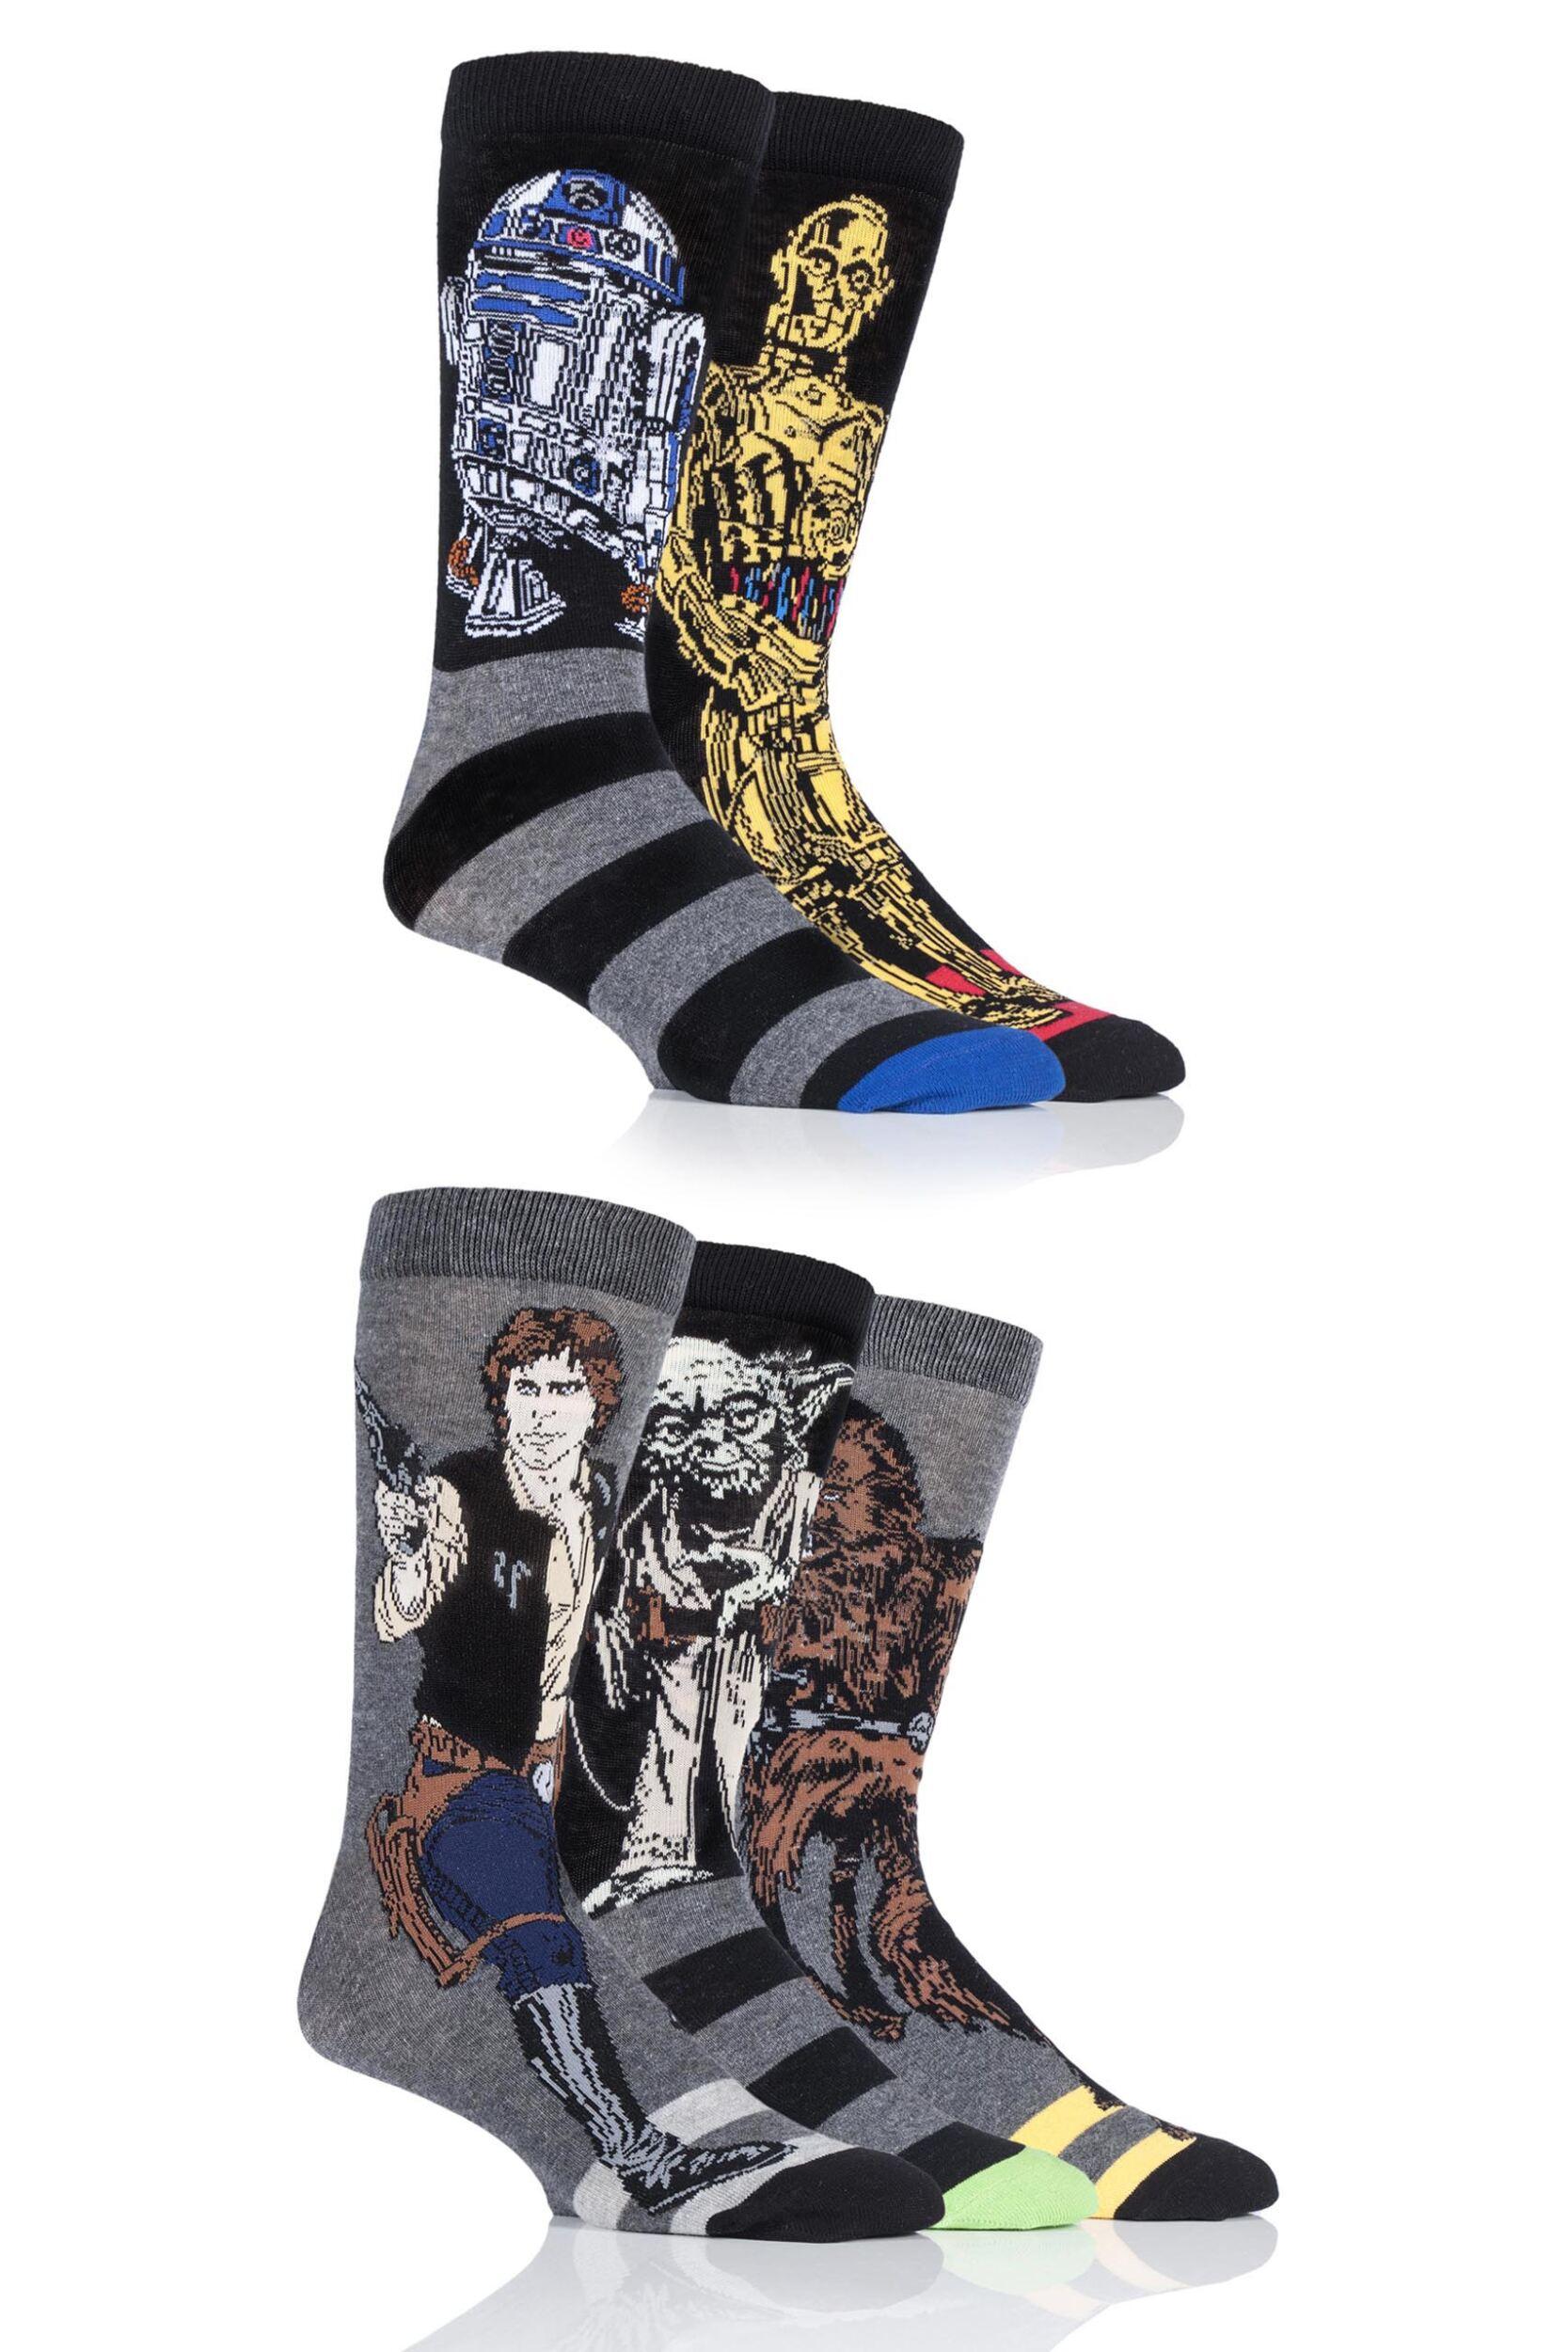 Mens 5 Pair SockShop Disney Star Wars Heroes Yoda, Chewbacca, C-3P0, R2-D2 and Han Solo Socks